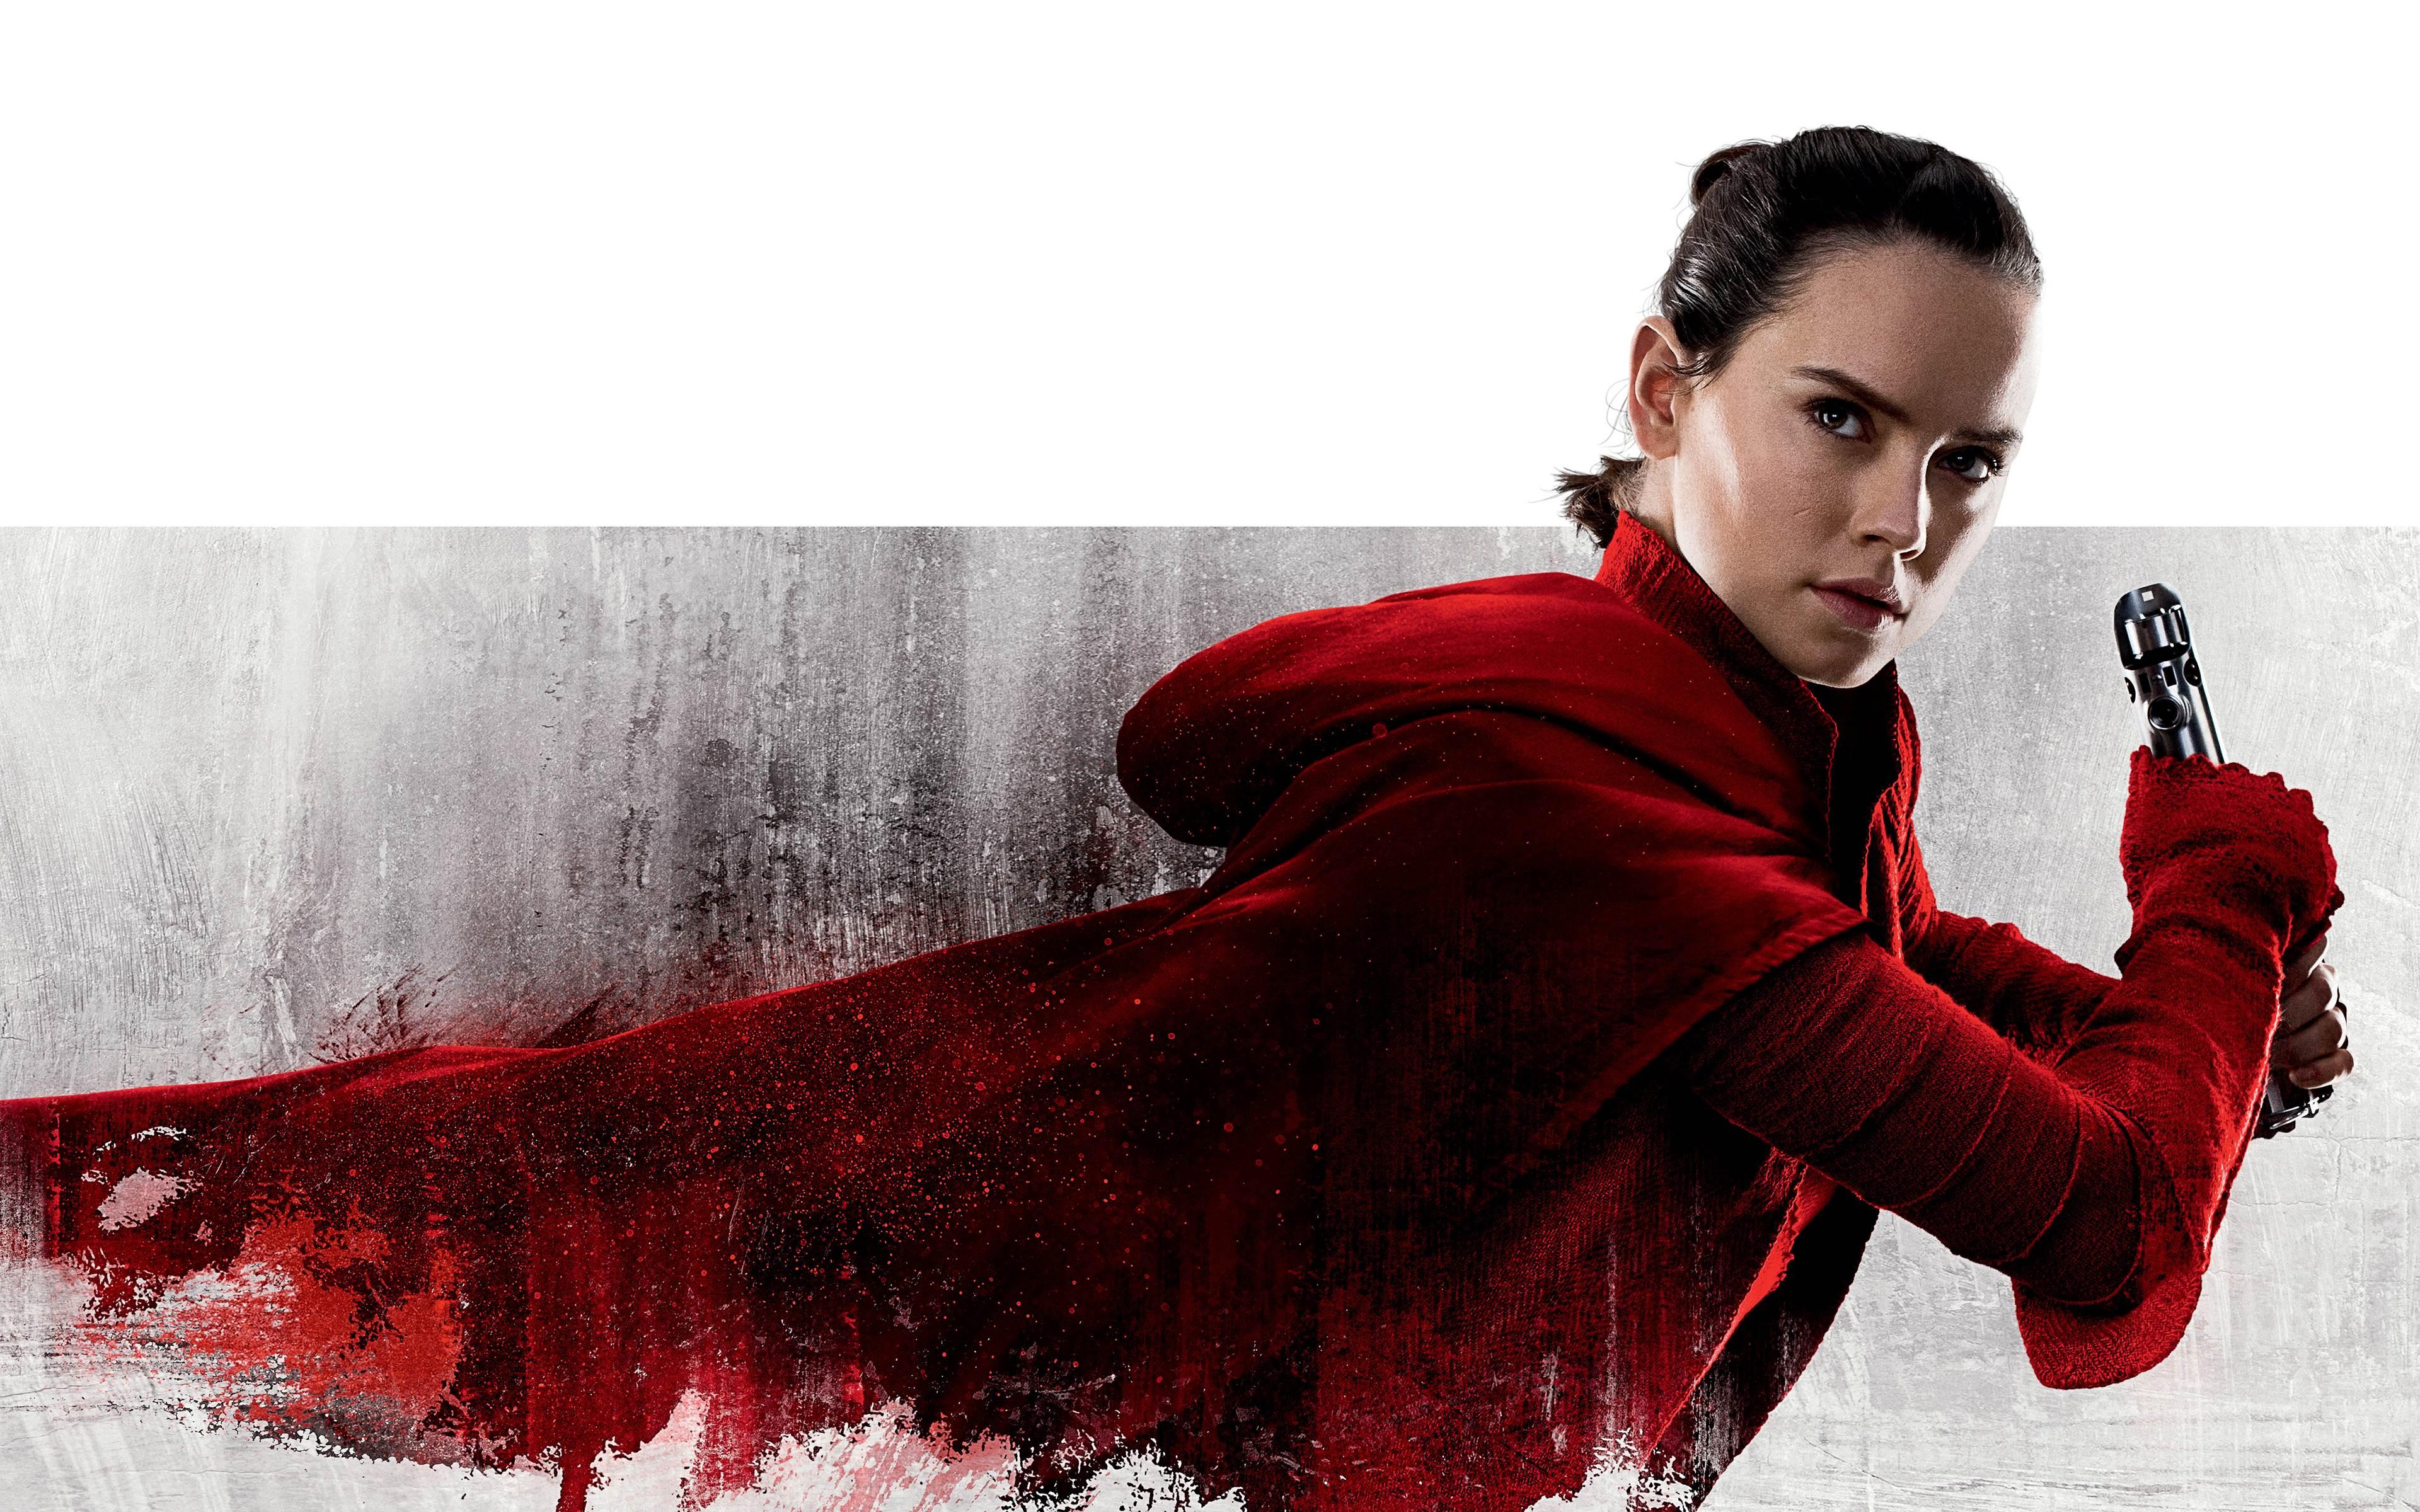 Star Wars The Last Jedi Rey Wallpaper 1080p , HD Wallpaper & Backgrounds